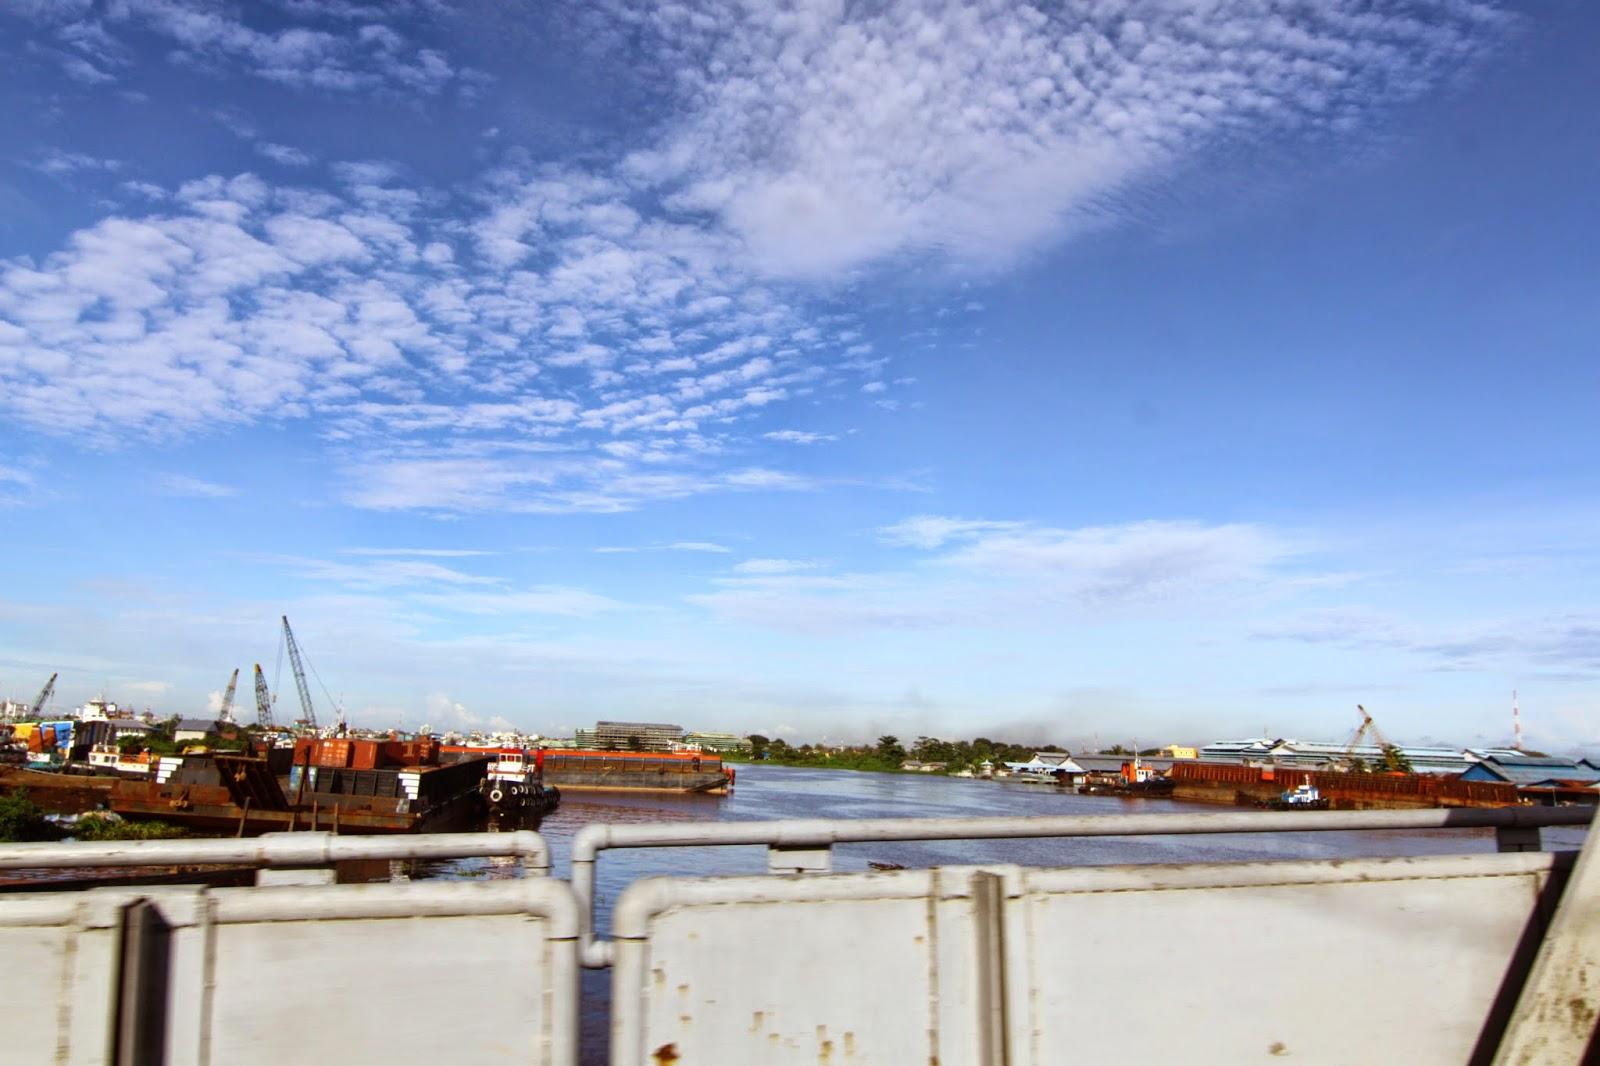 jambatan Sungai Kapuas, sungai utama di Pontianak